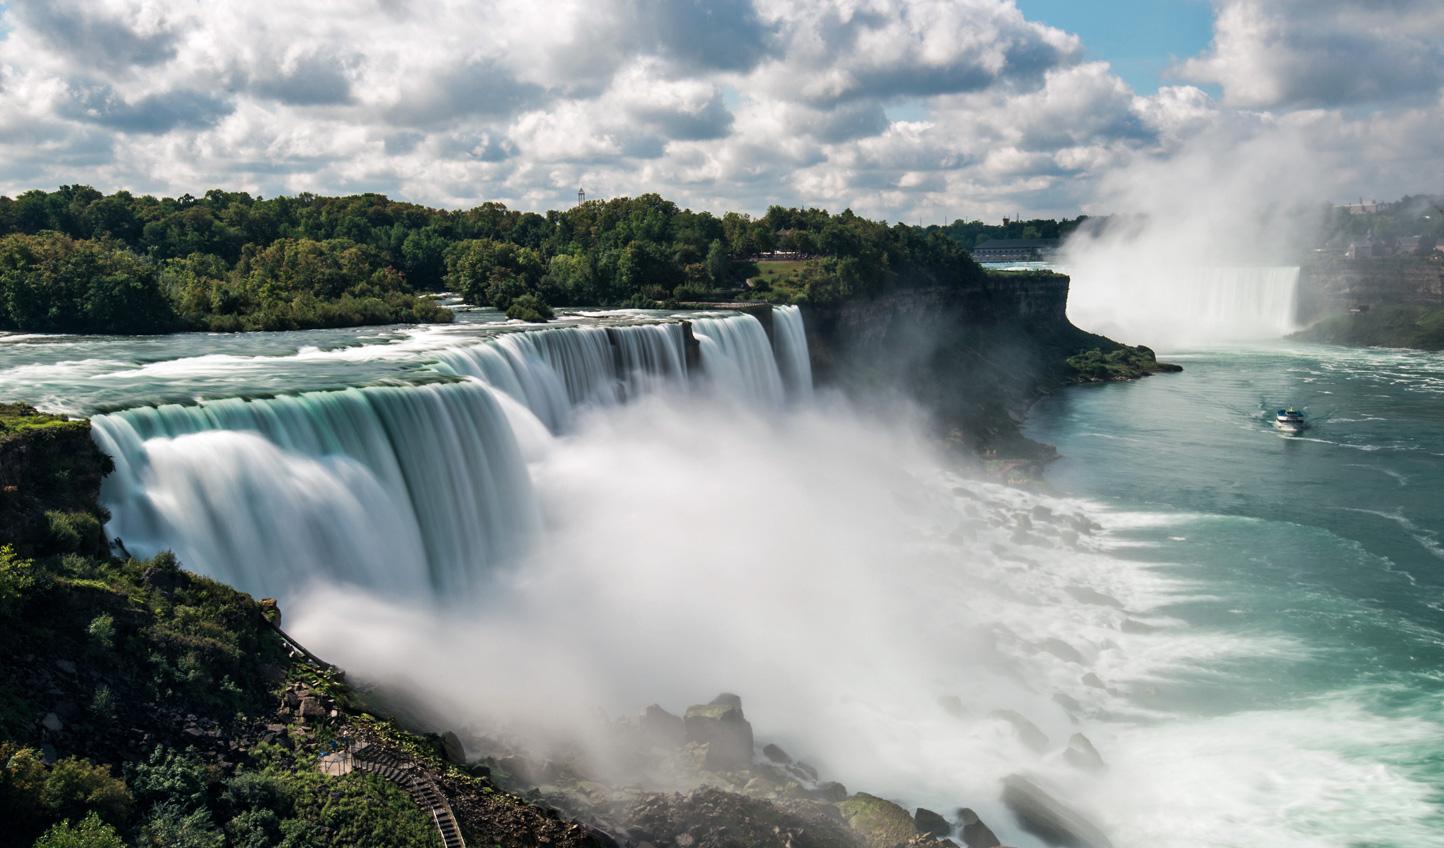 Feel the force of the Niagara Falls